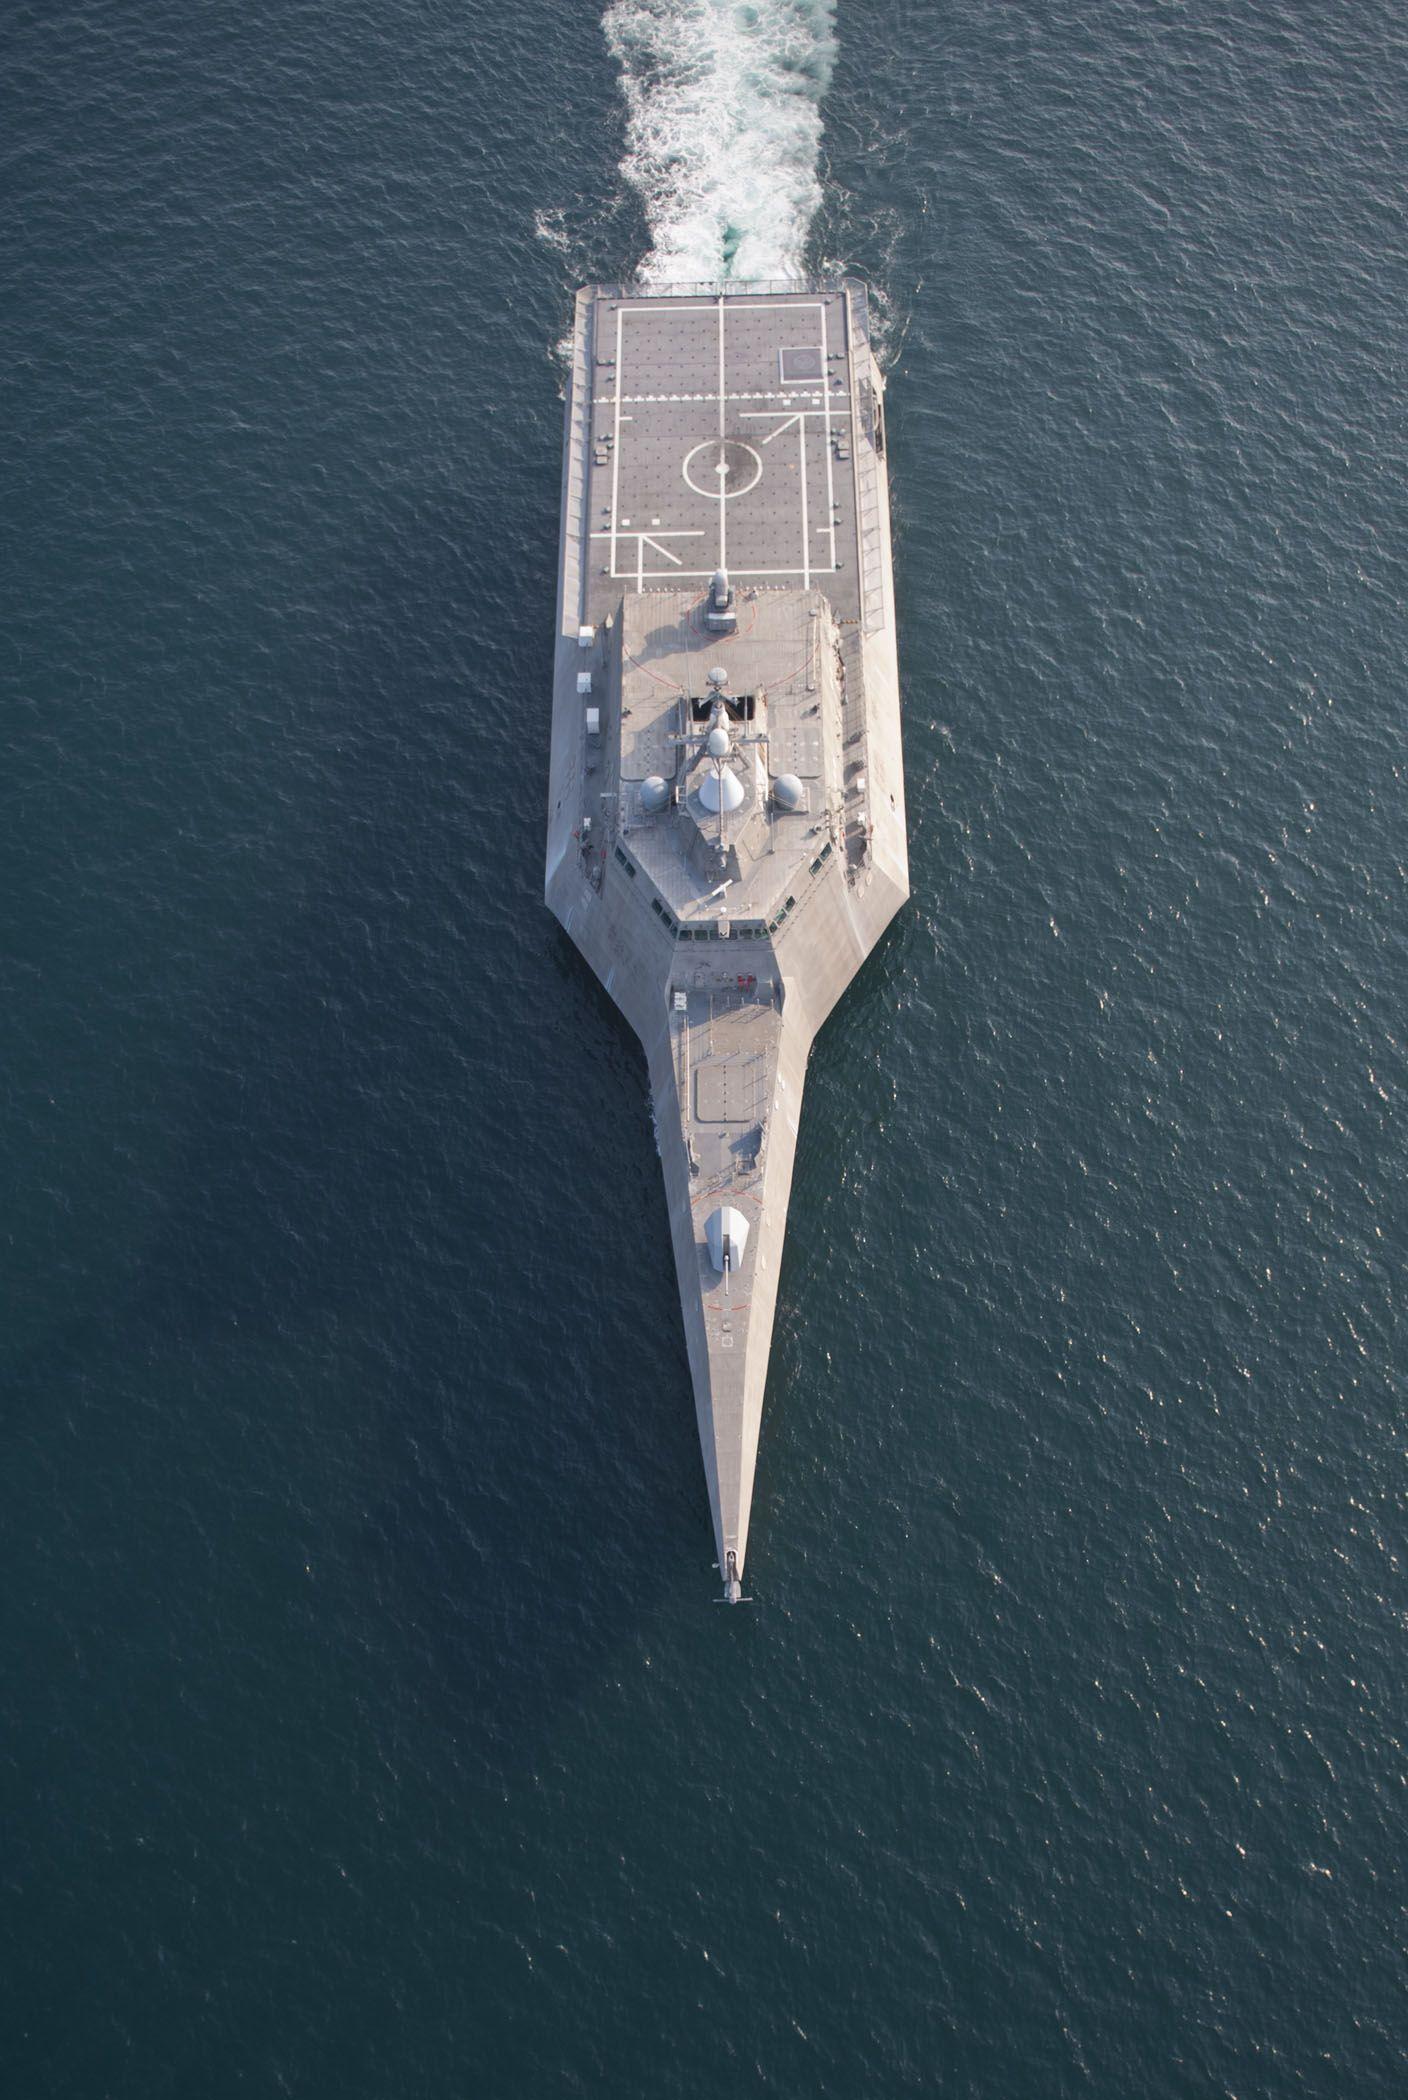 0b79cc0c32e USS Independence LCS-2